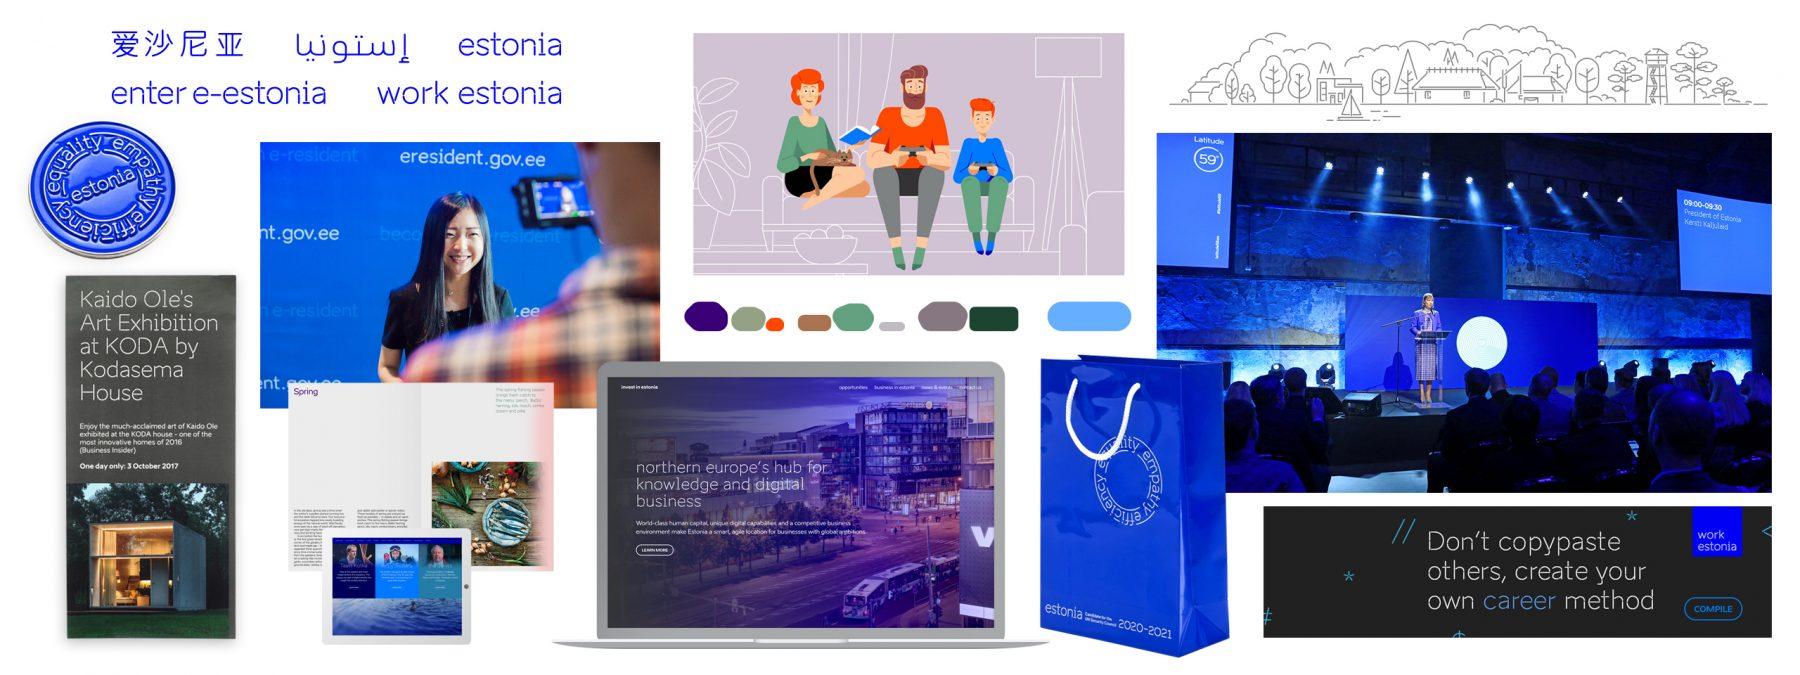 brand estonia visual language